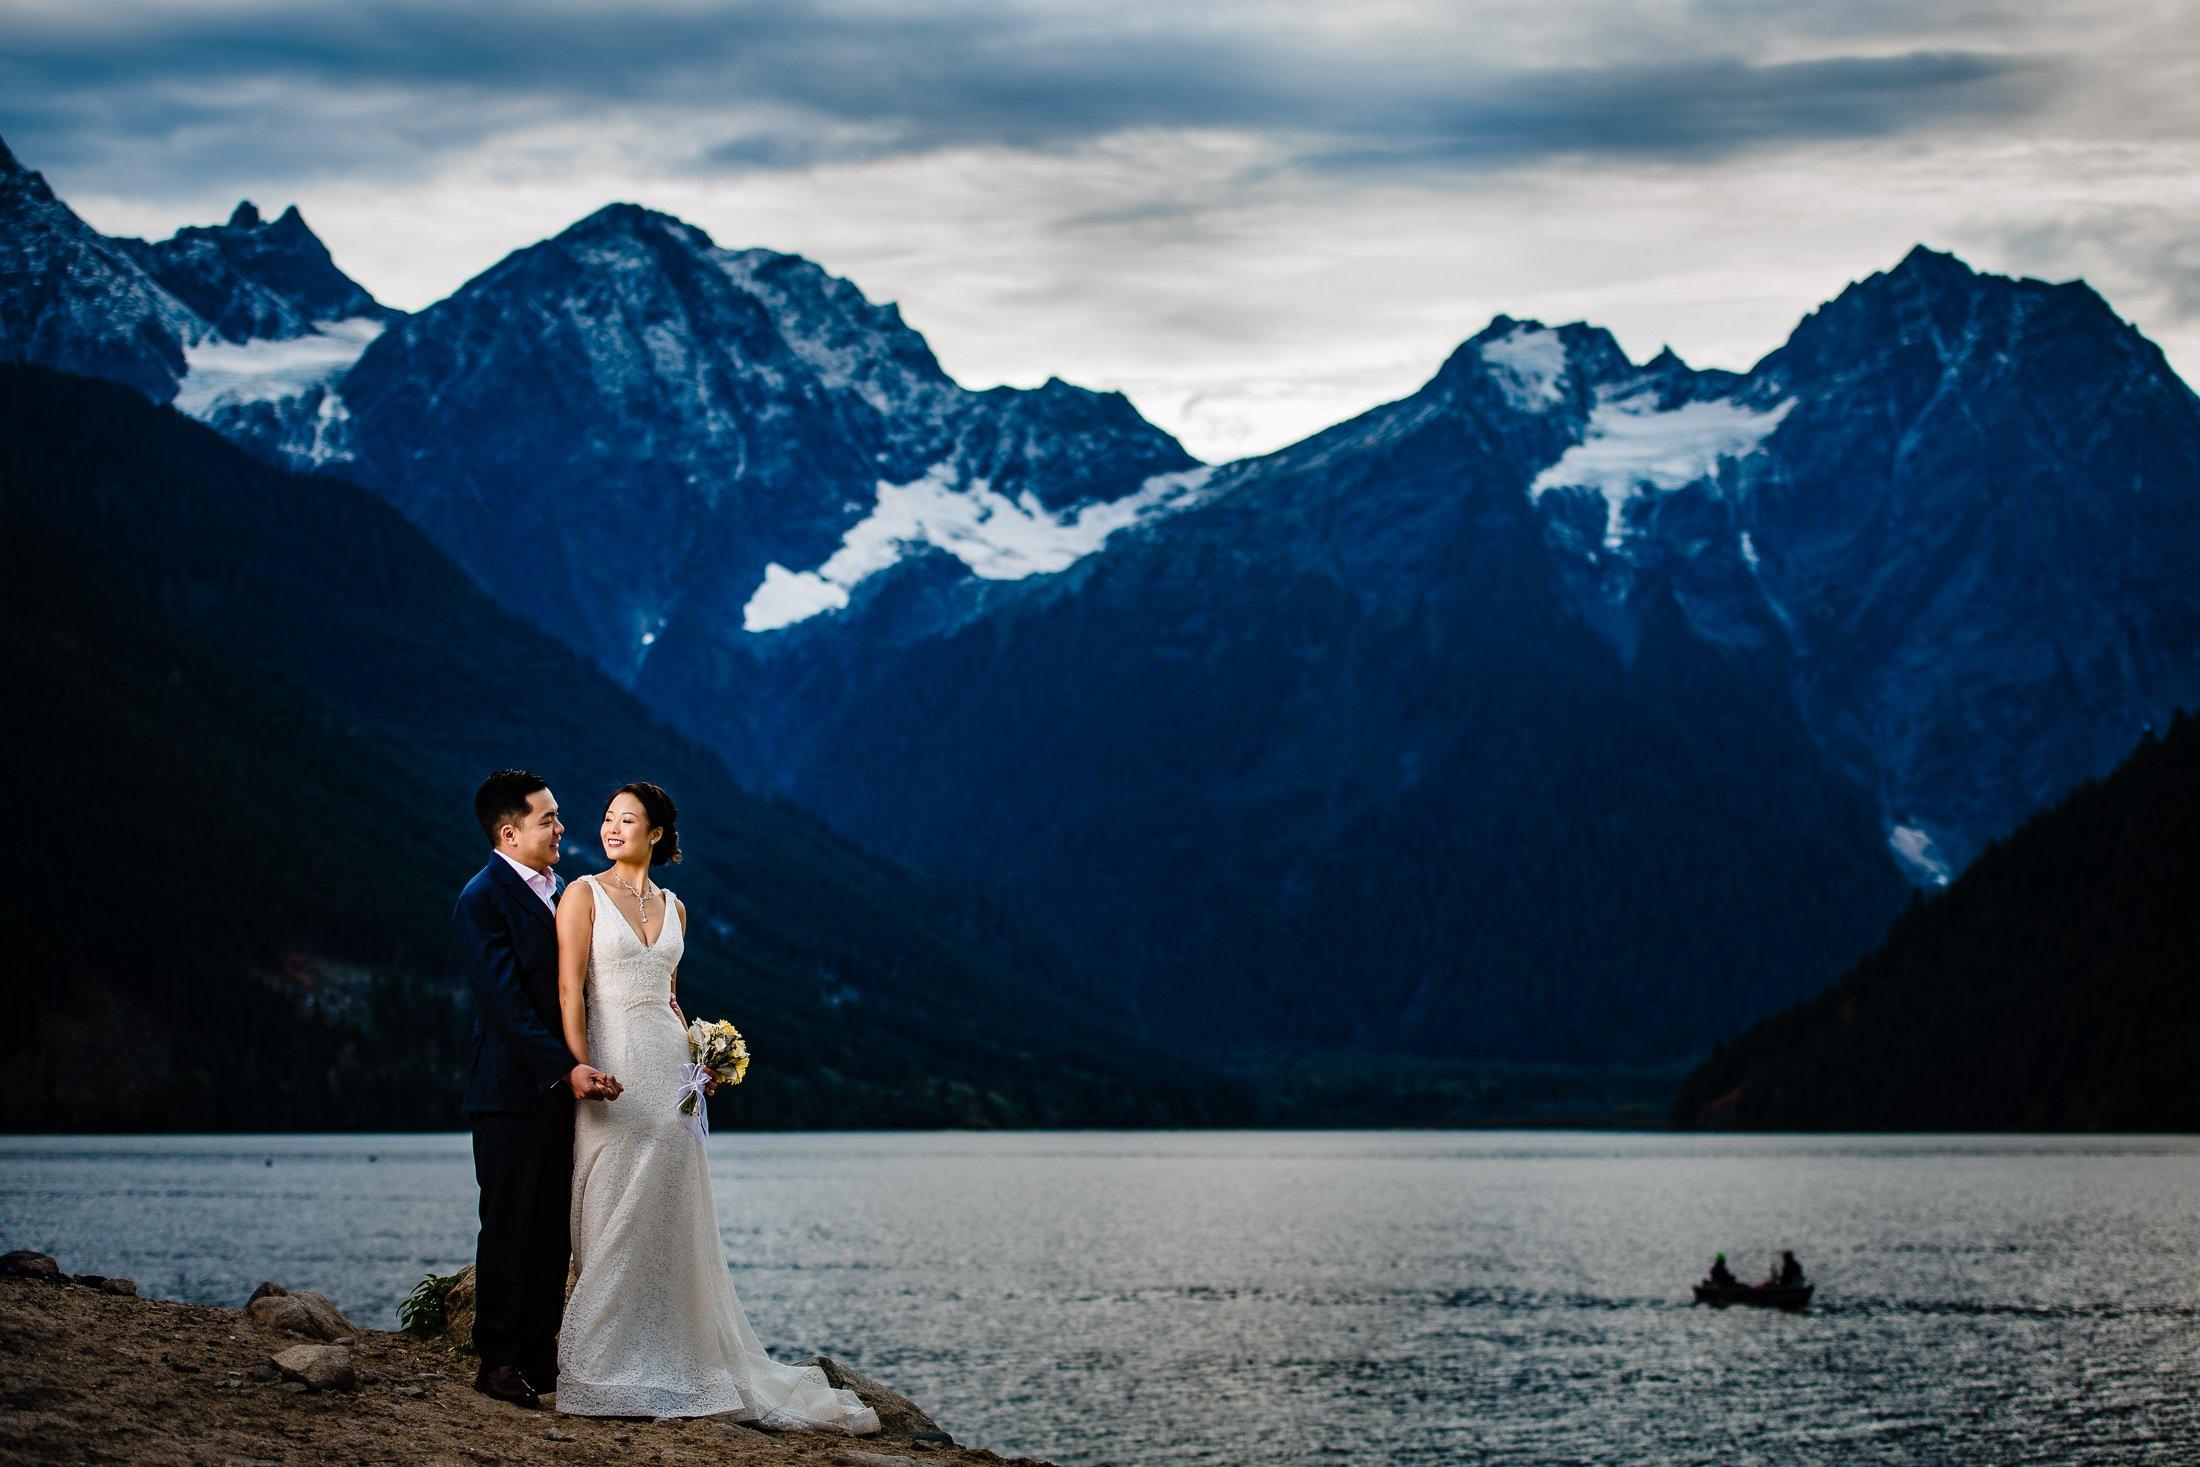 005 - Adventure elopement vancouver